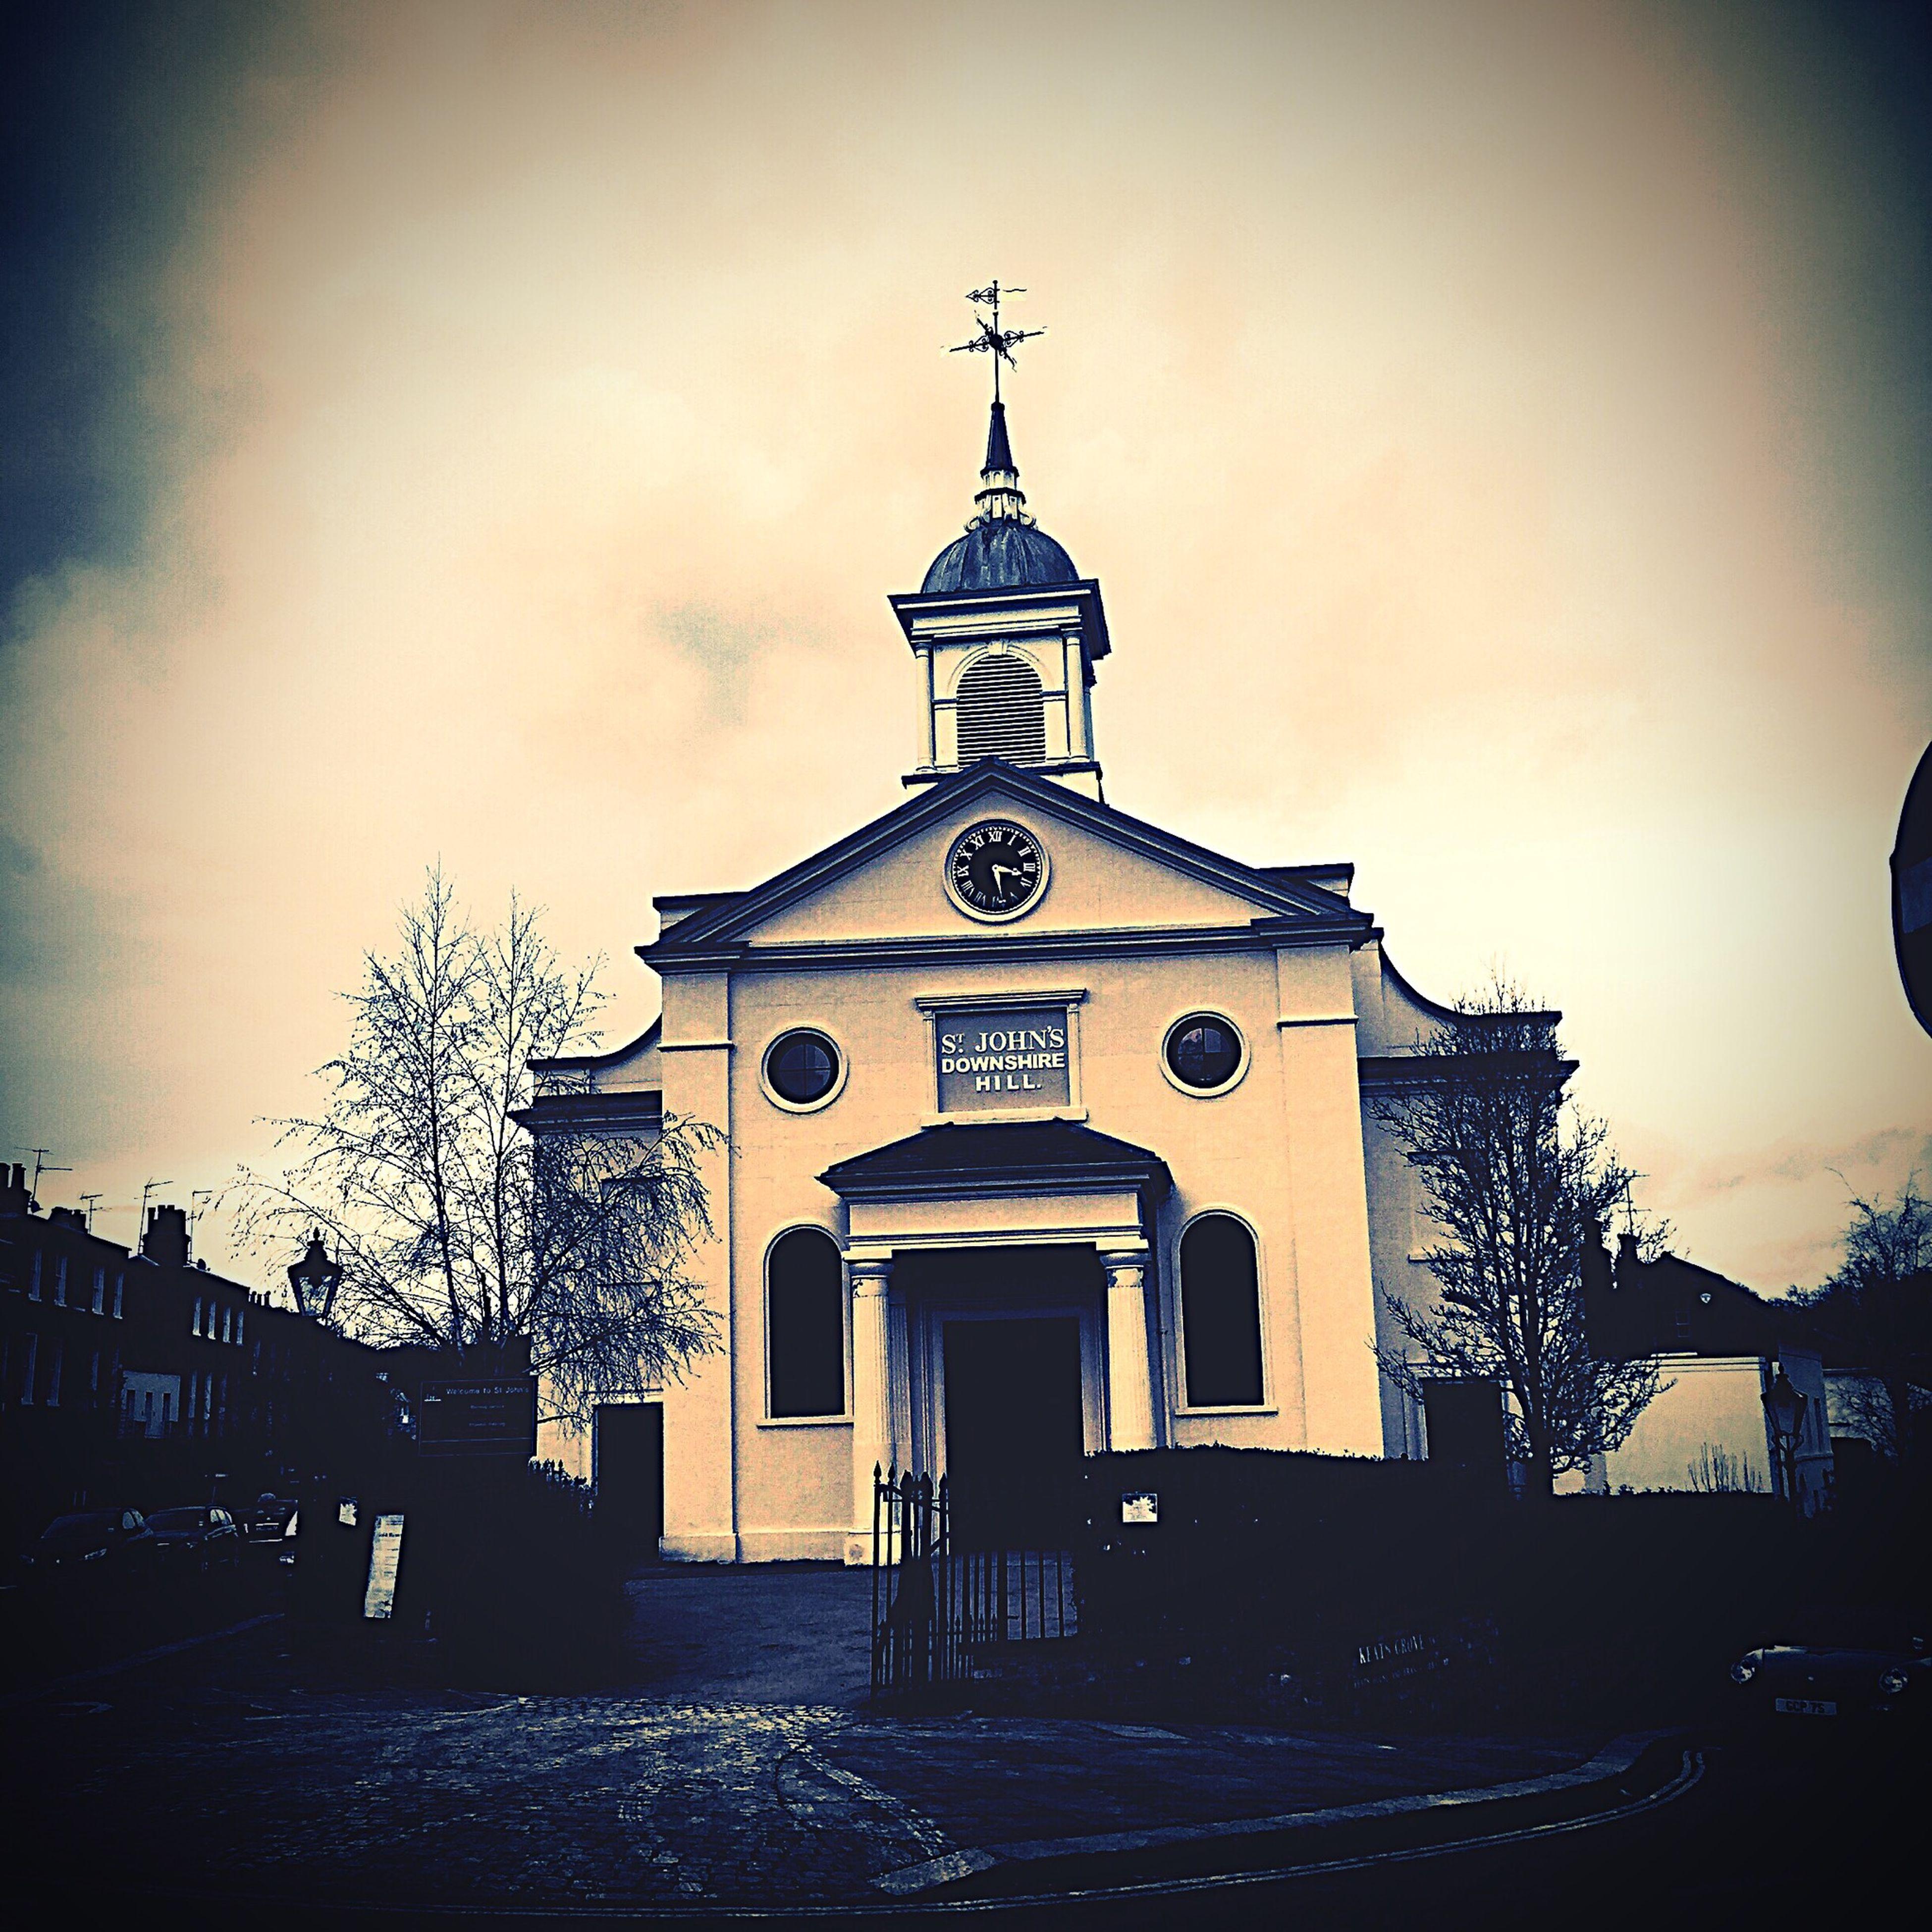 Found this church whilst wandering around London.